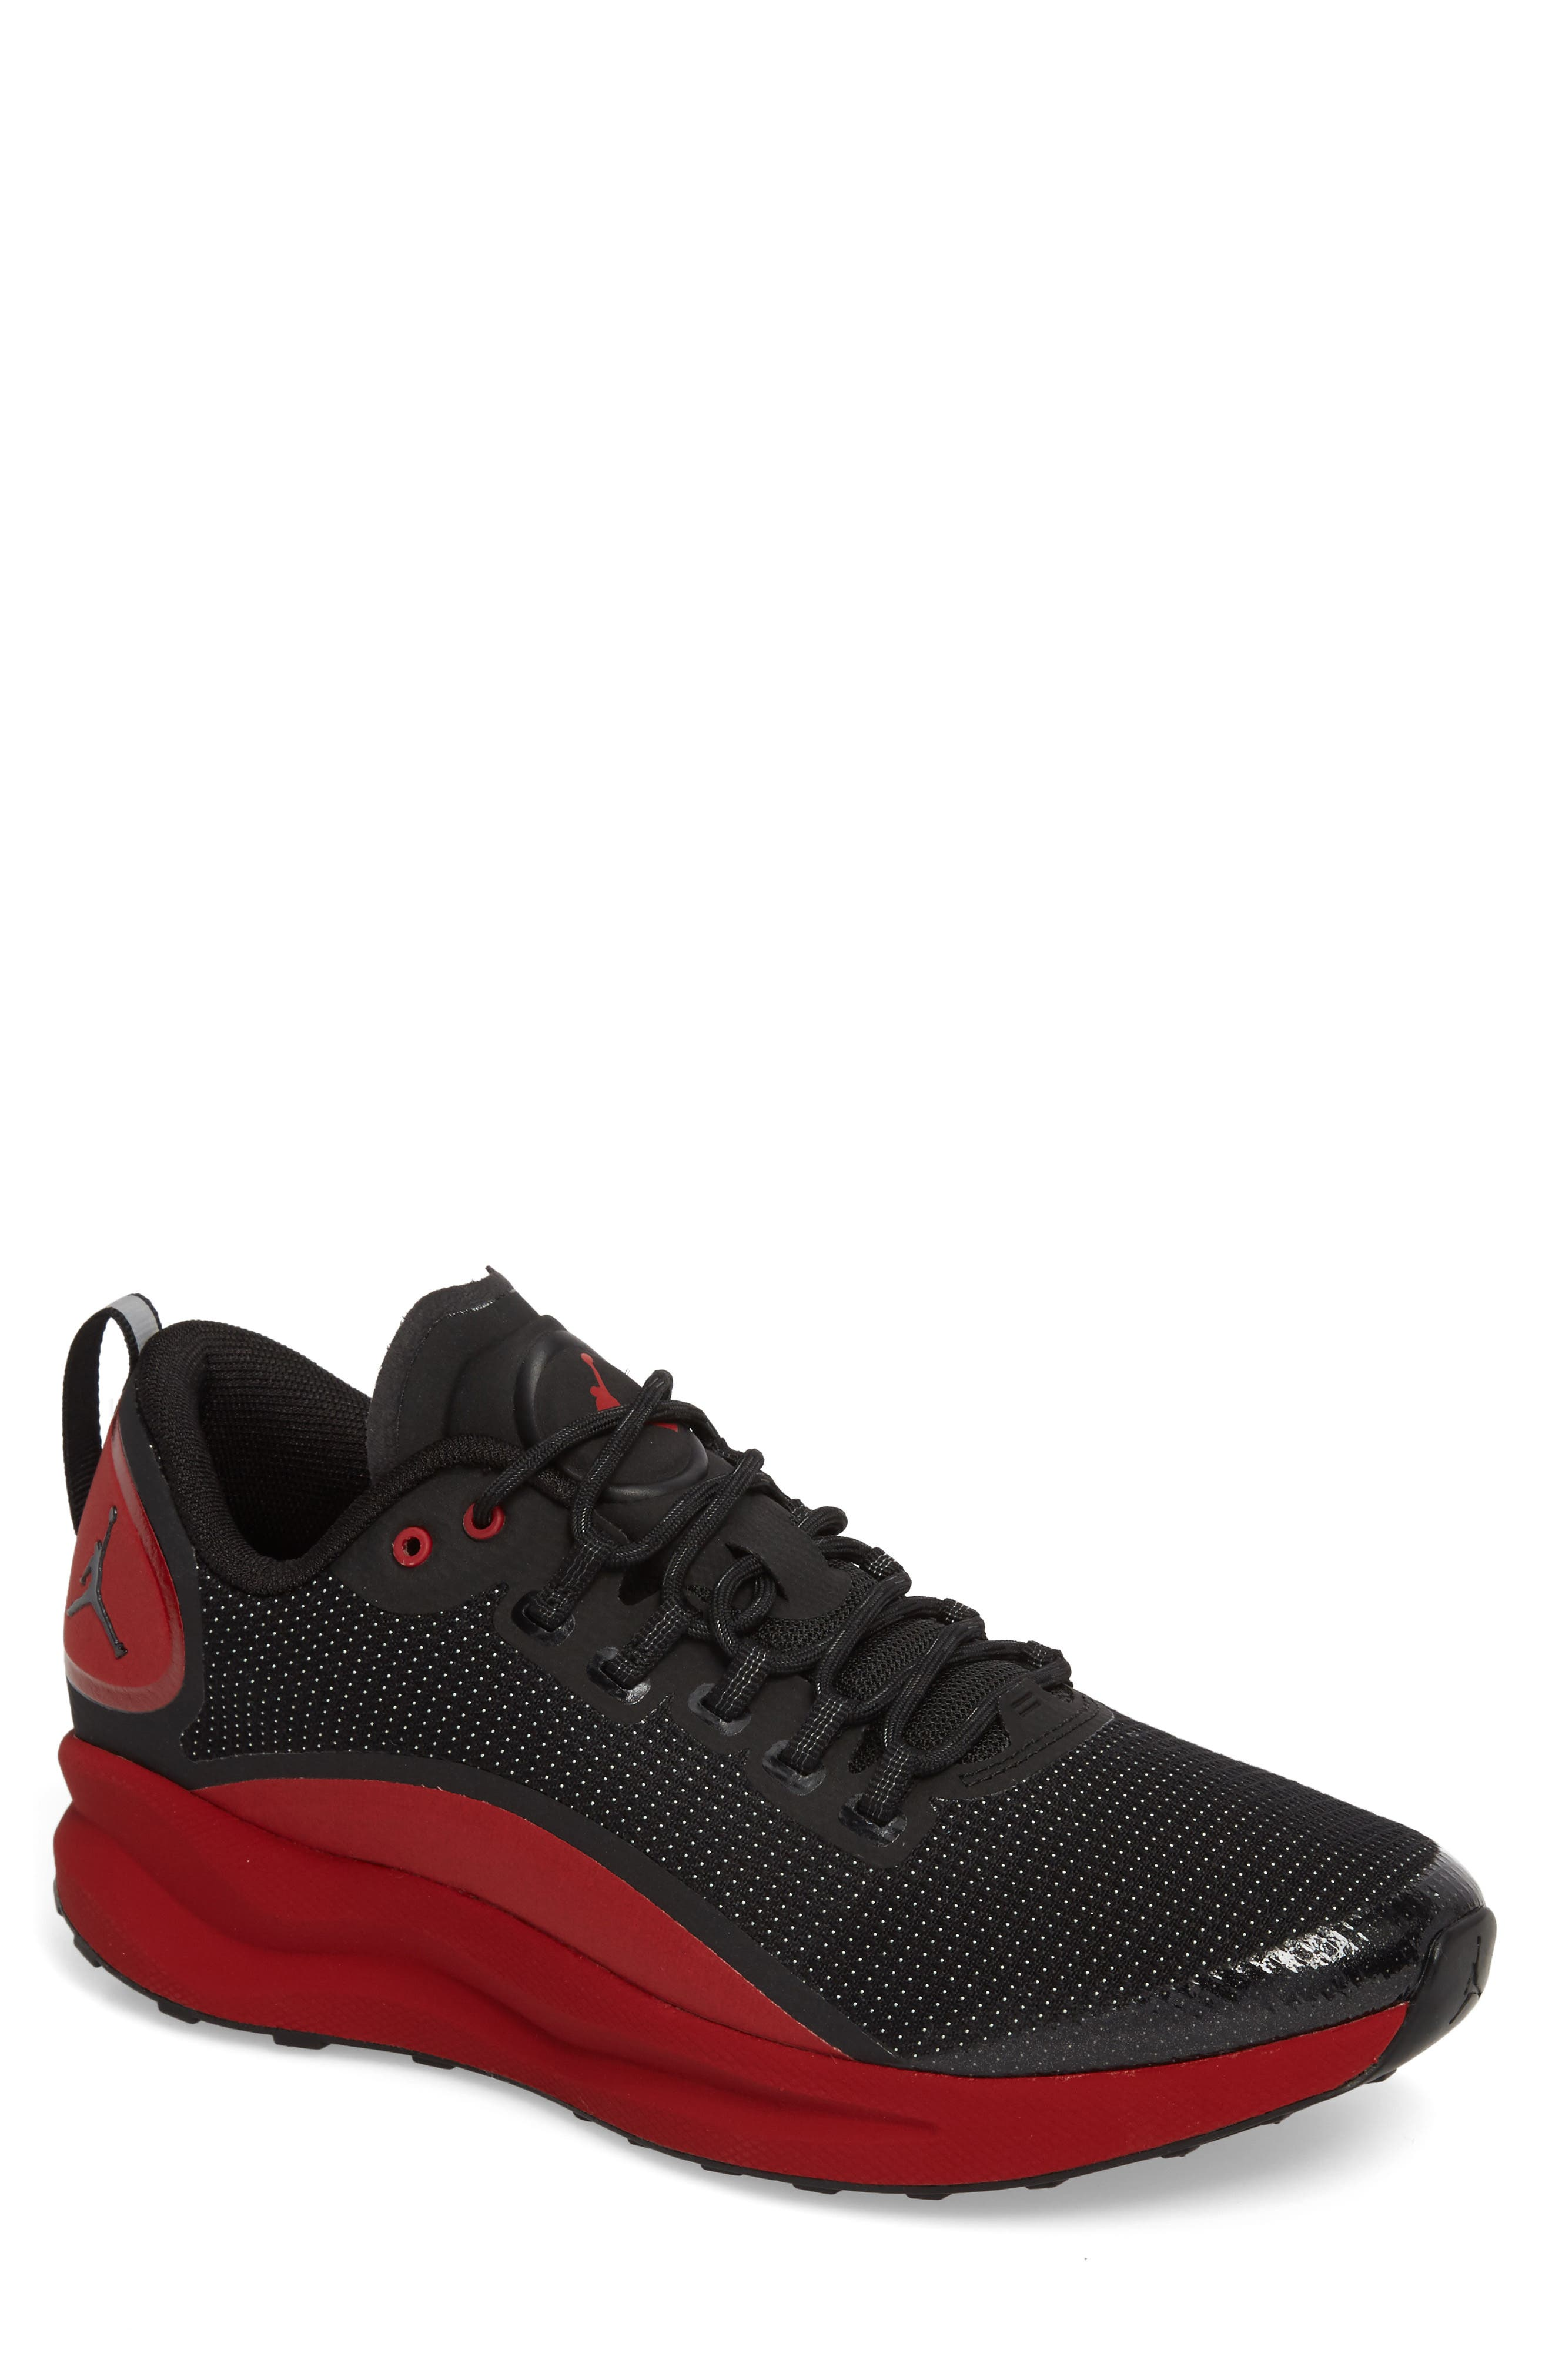 Jordan Zoom Tenacity Running Shoe,                             Main thumbnail 1, color,                             001